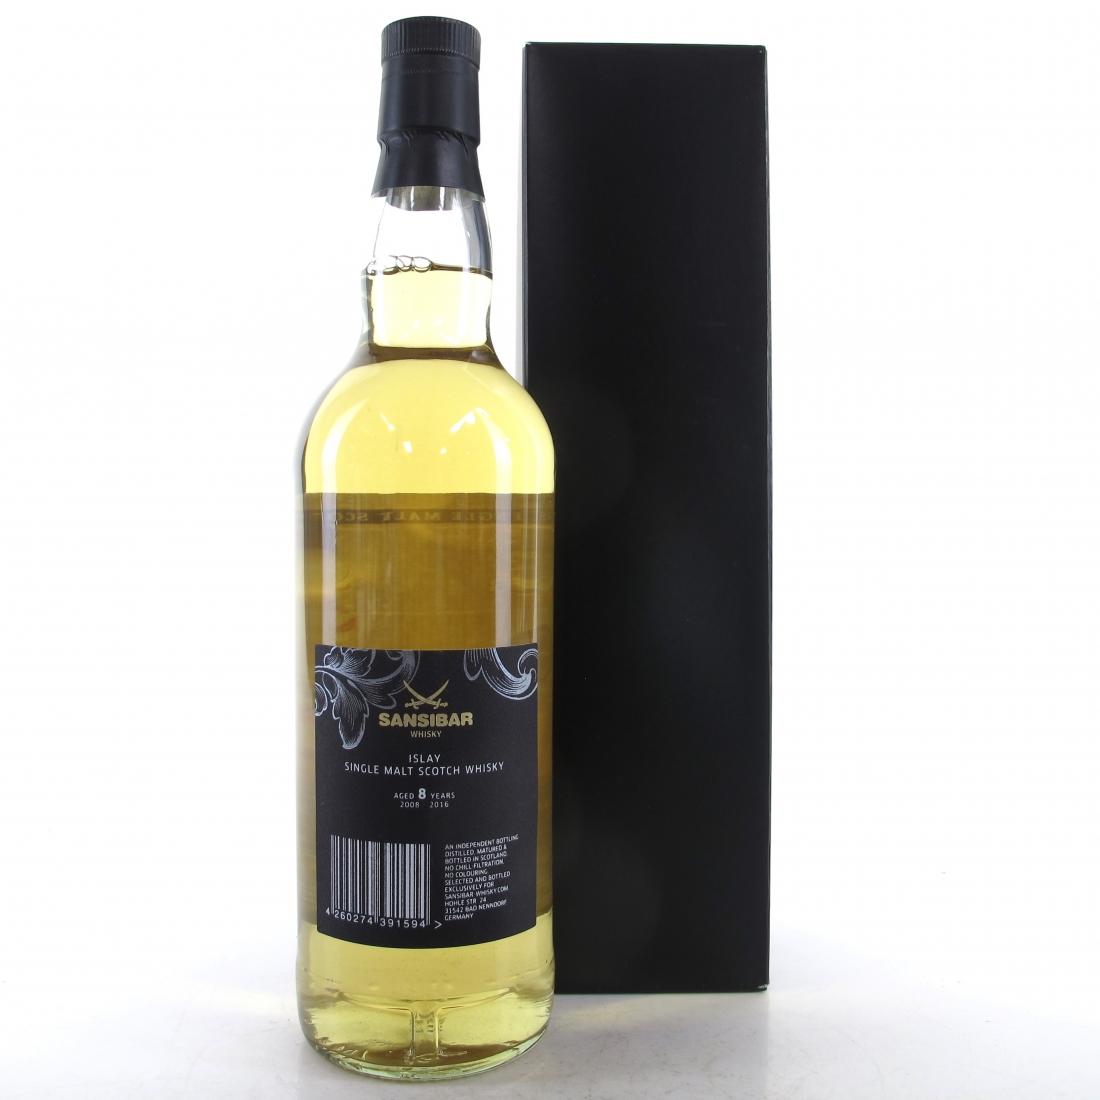 Caol Ila 2008 Sansibar 8 Year Old Single Cask / Dutch Whisky Association